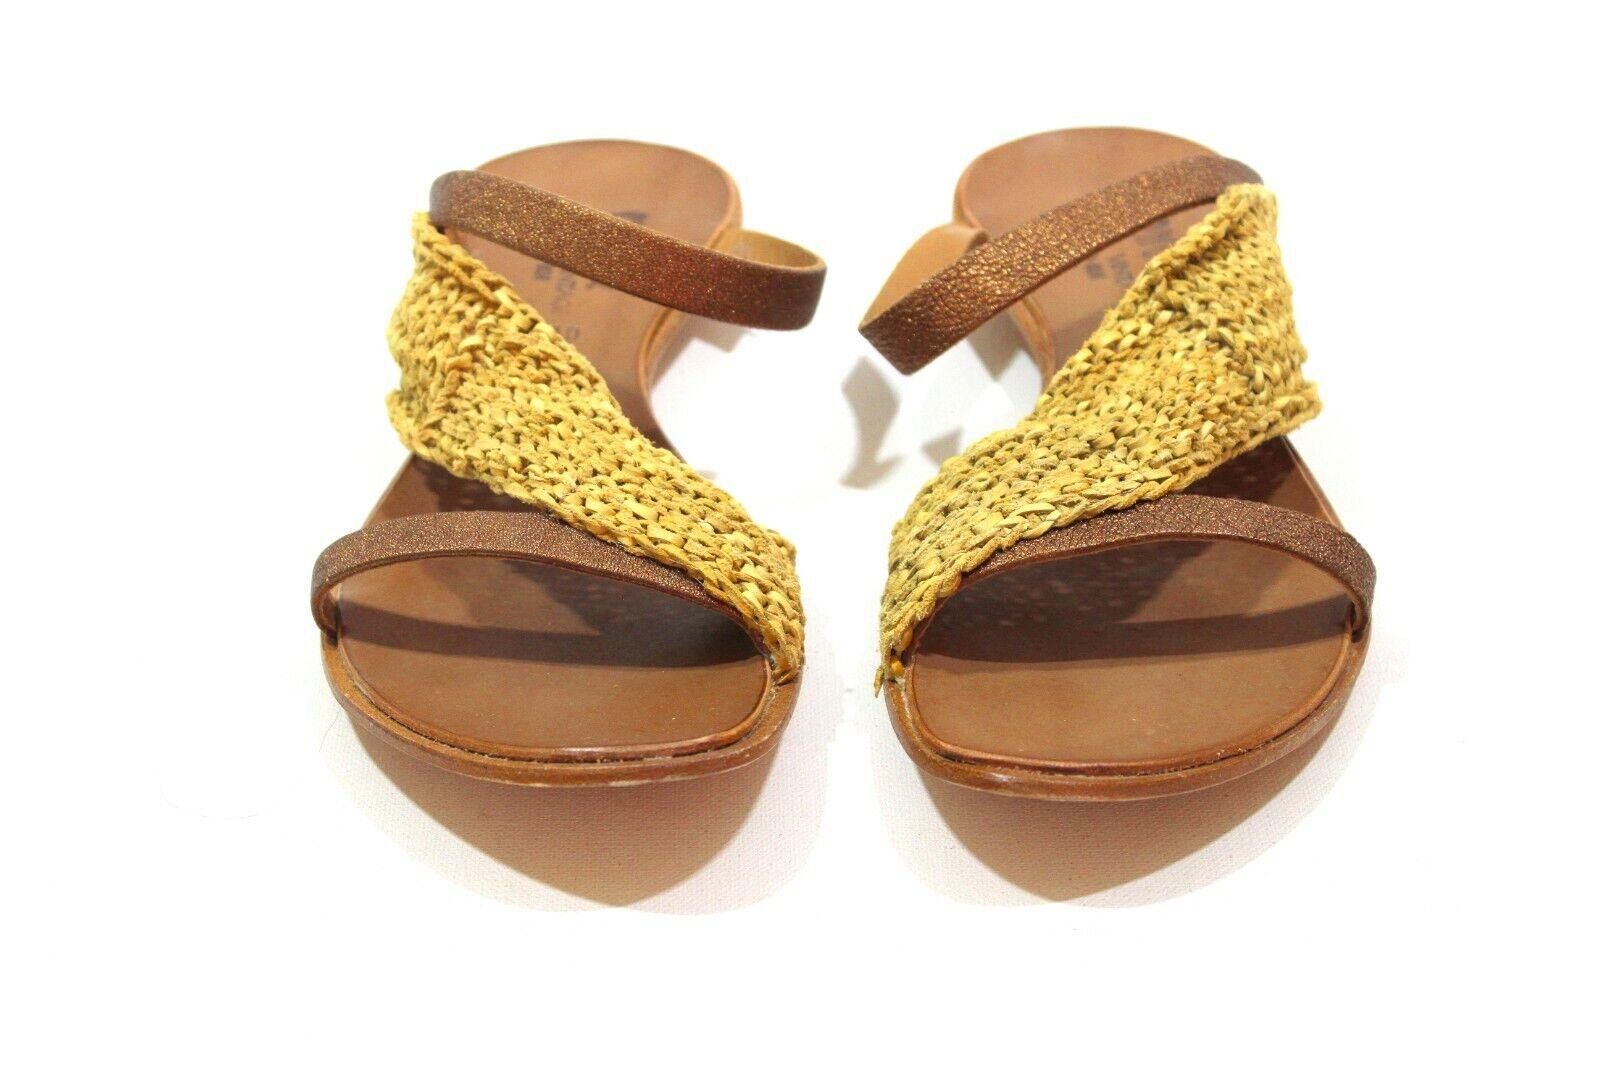 Cydwoq Siamese Slides SandalsMustard Leather Handmade USA